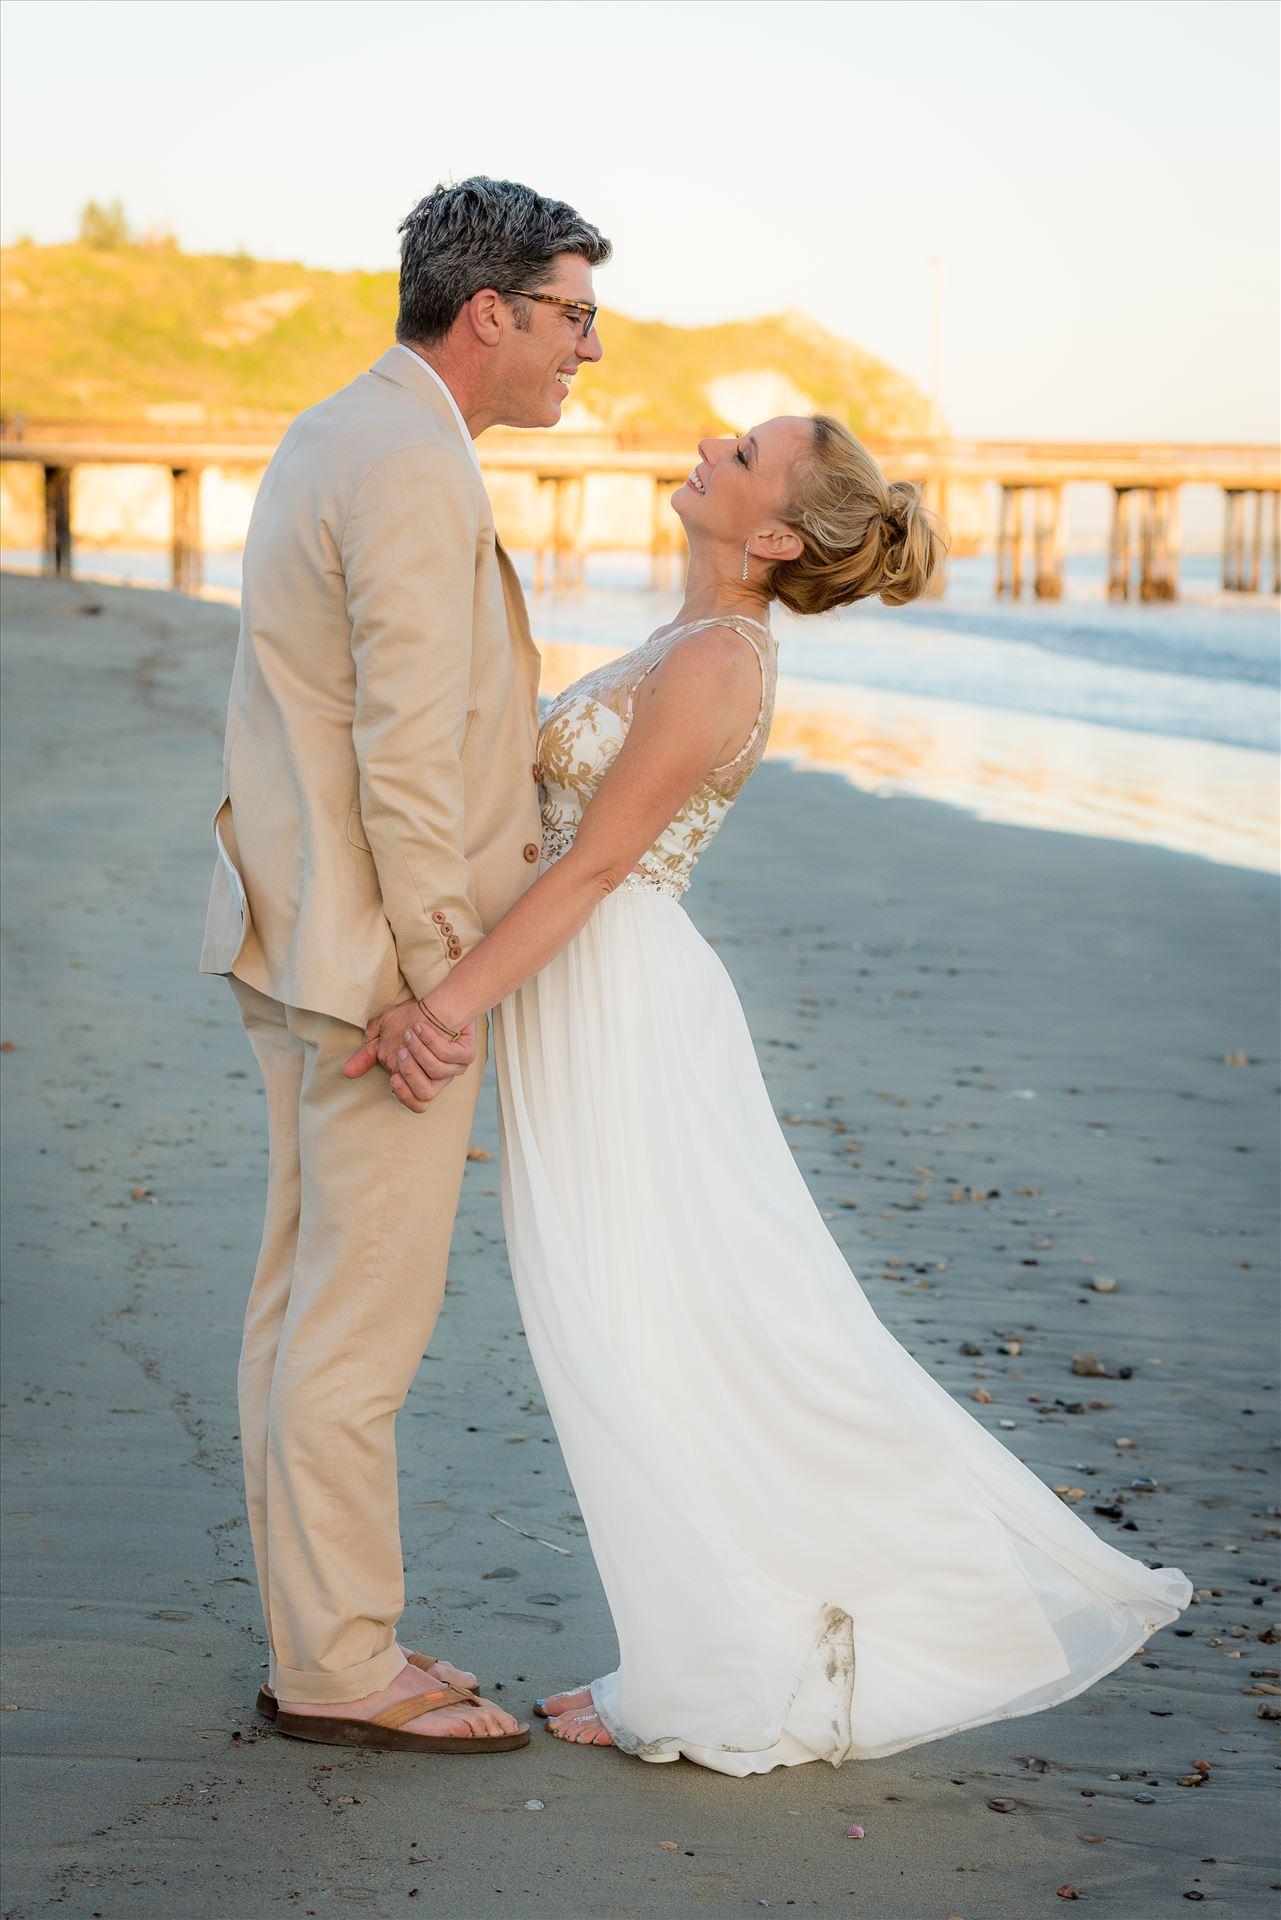 Ross Beach Wedding 14  by Sarah Williams